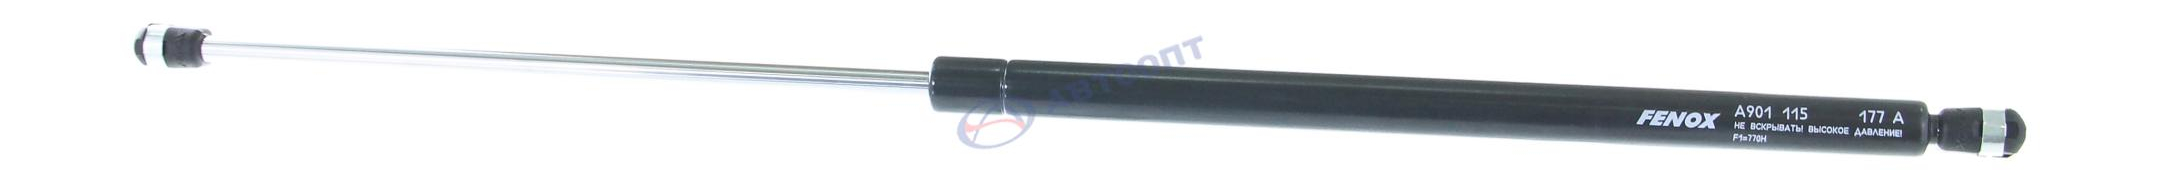 Амортизатор багажника (зад. двери) СОБОЛЬ, Баргузин (11-6308010-10)